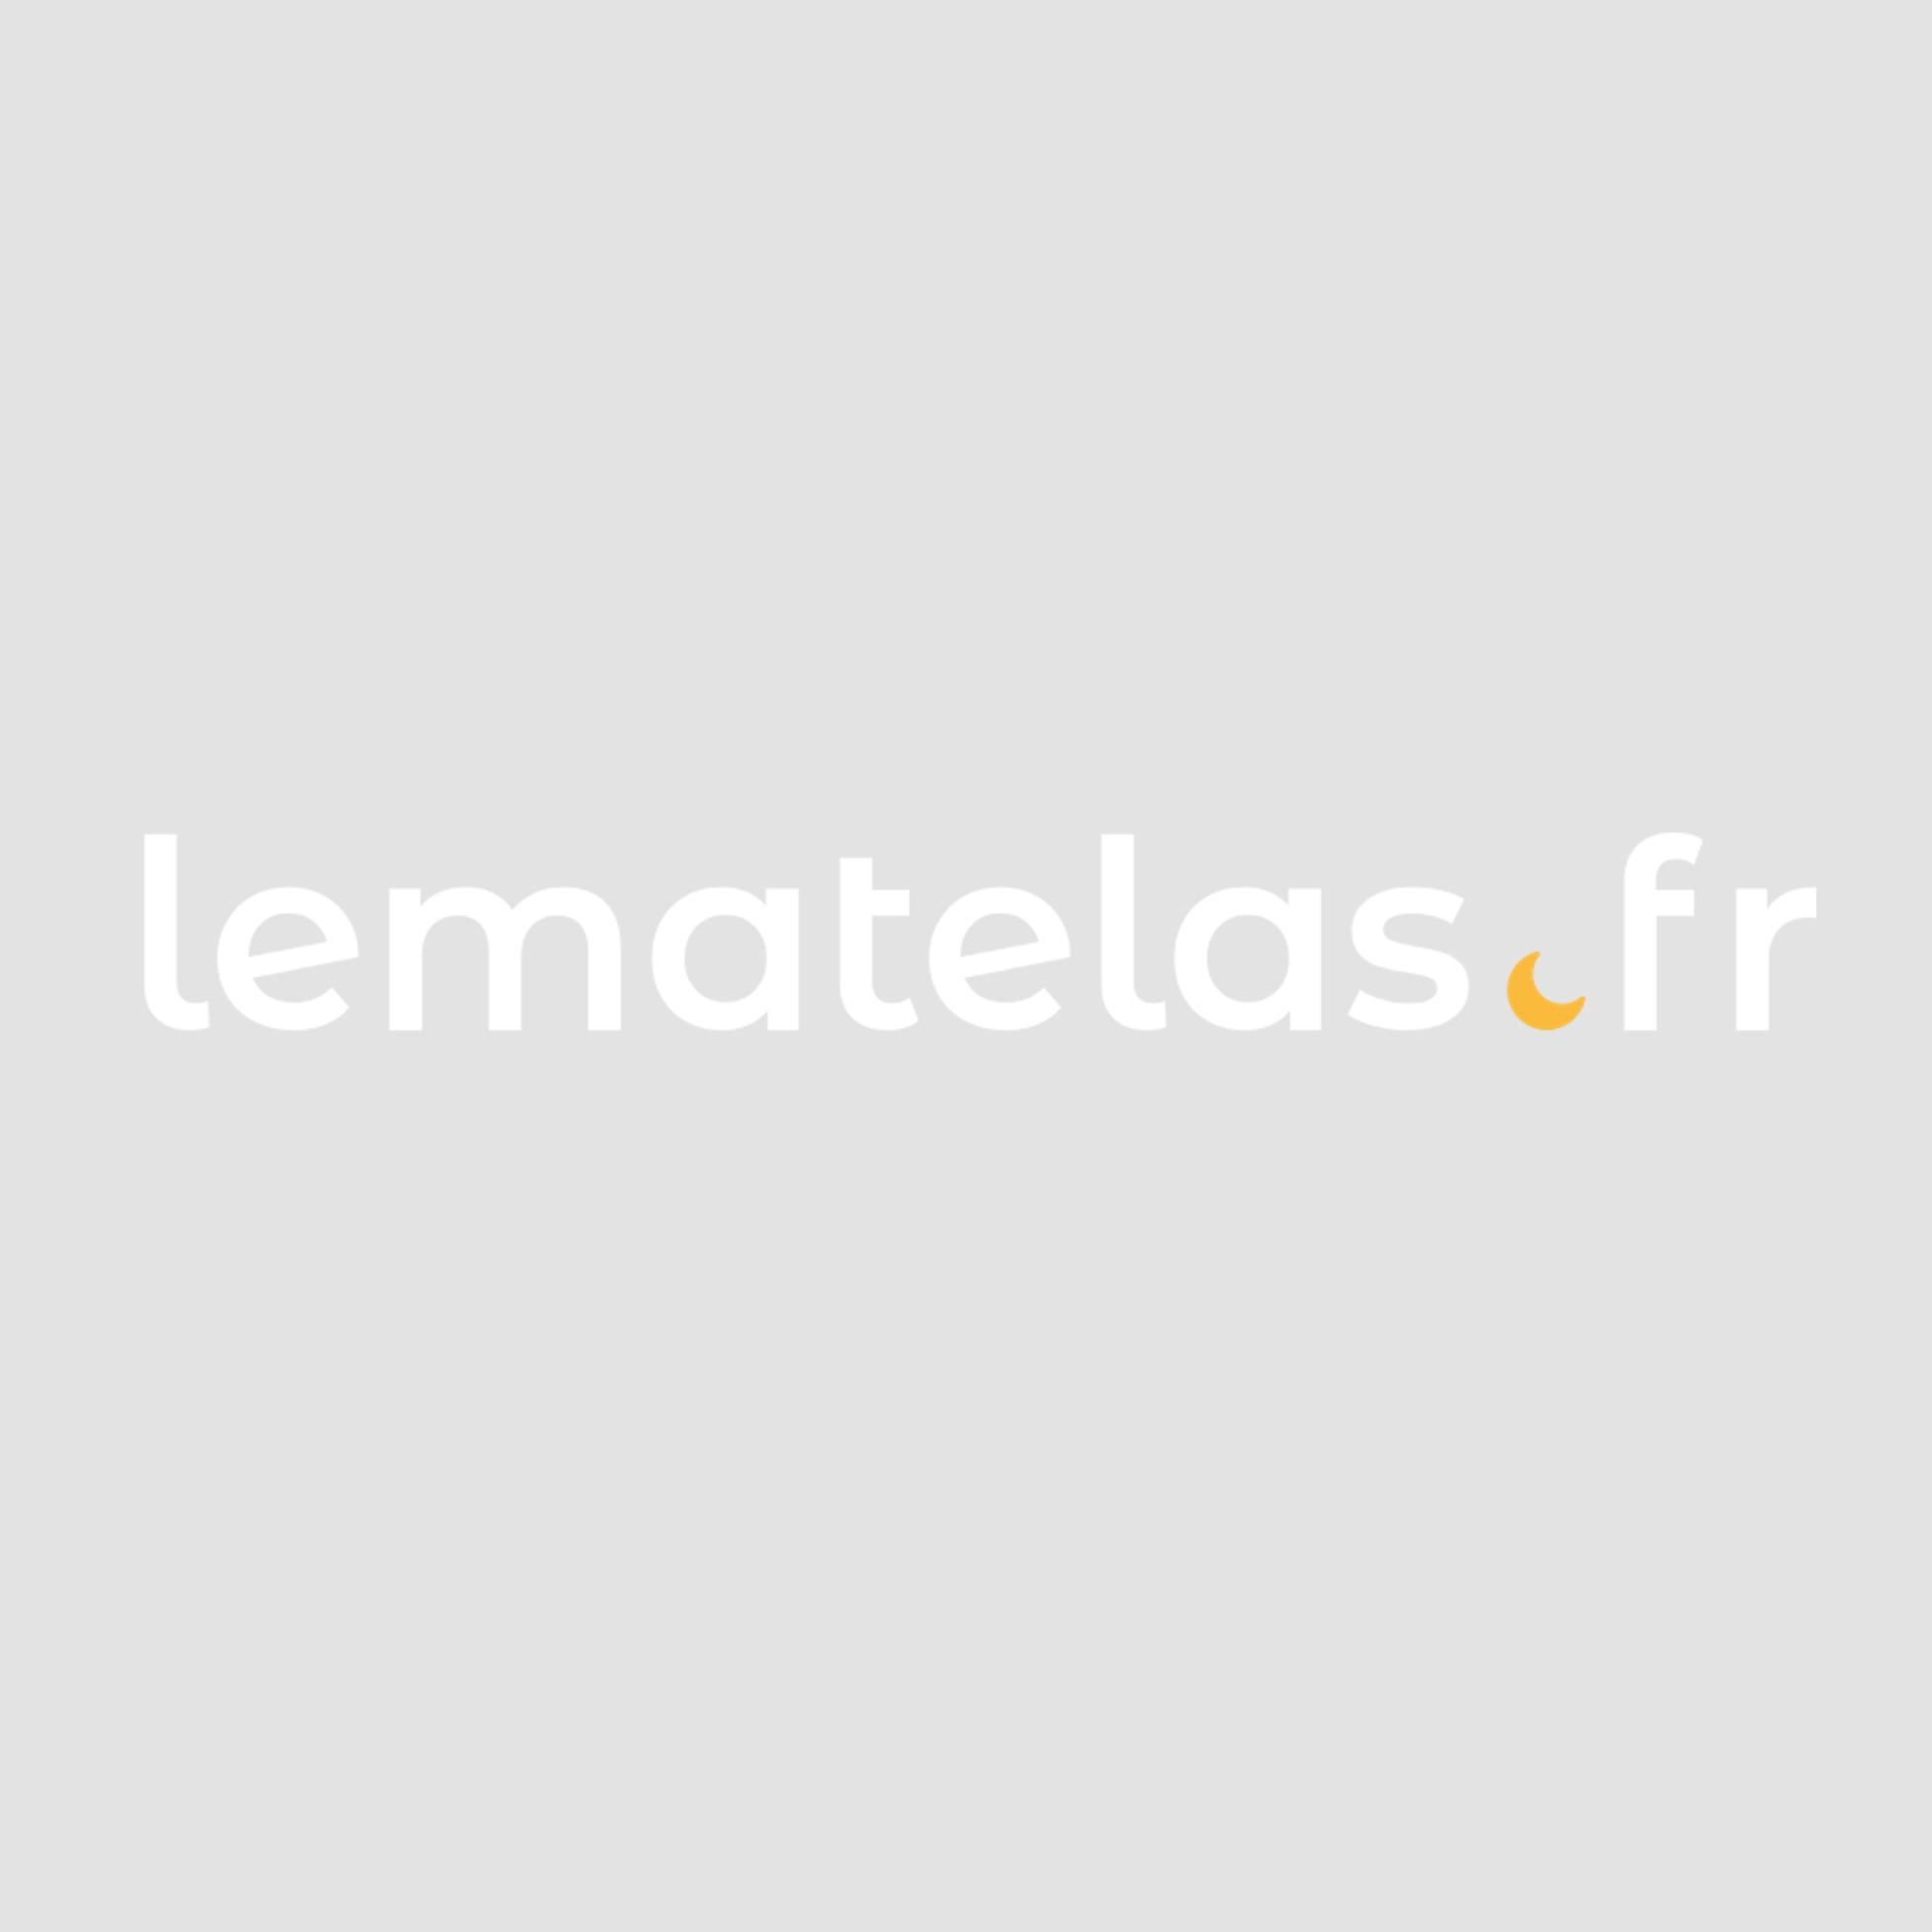 Drap housse protège matelas imperméable 2 en 1 Epeda blanc 120x190/200